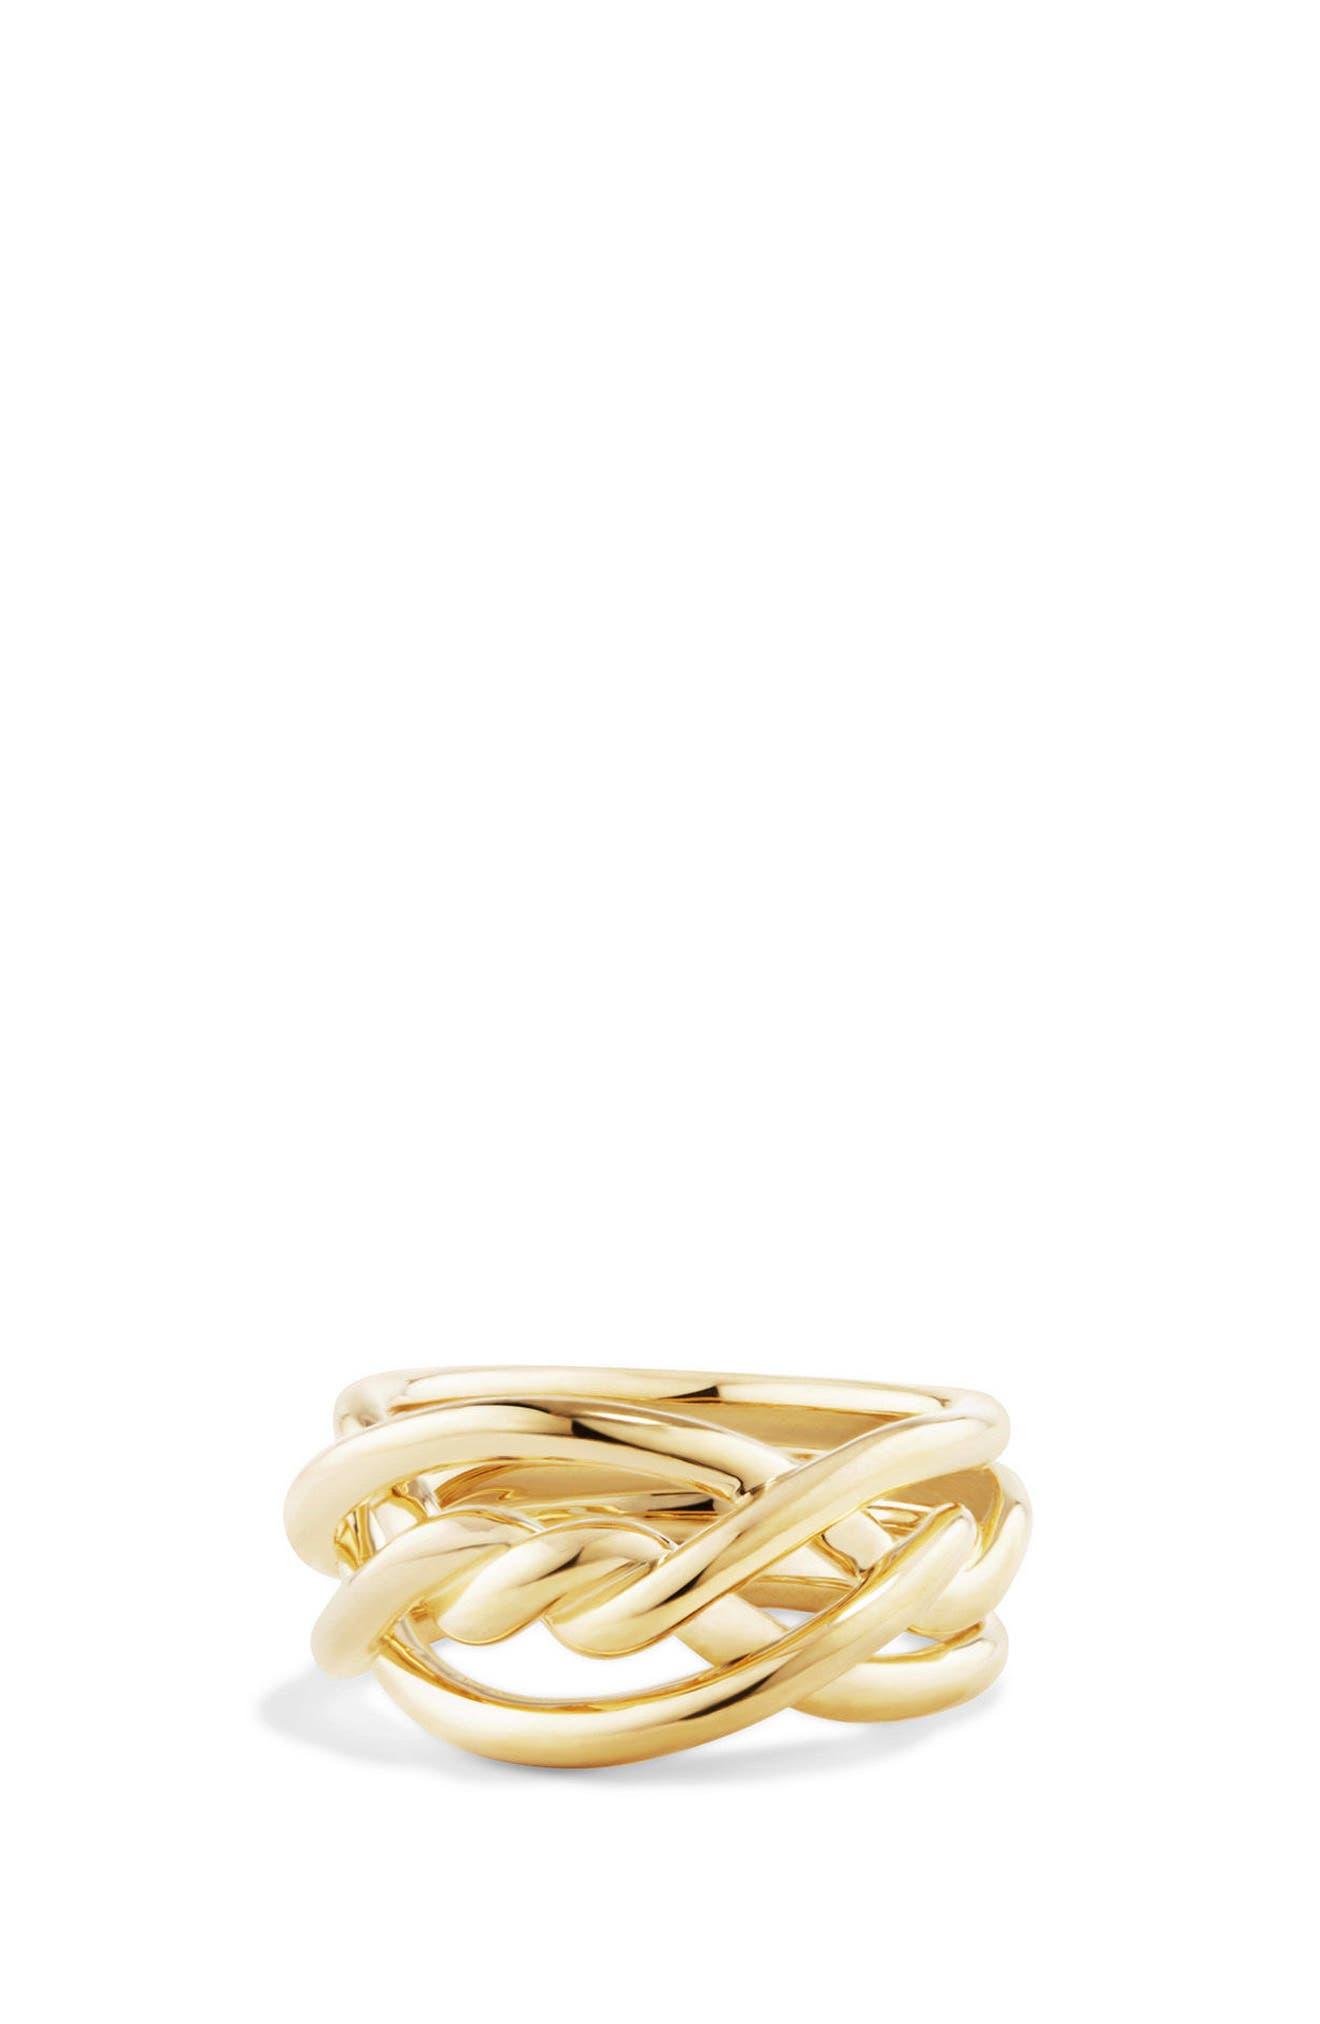 Main Image - David Yurman Continuance Ring in 18K Gold